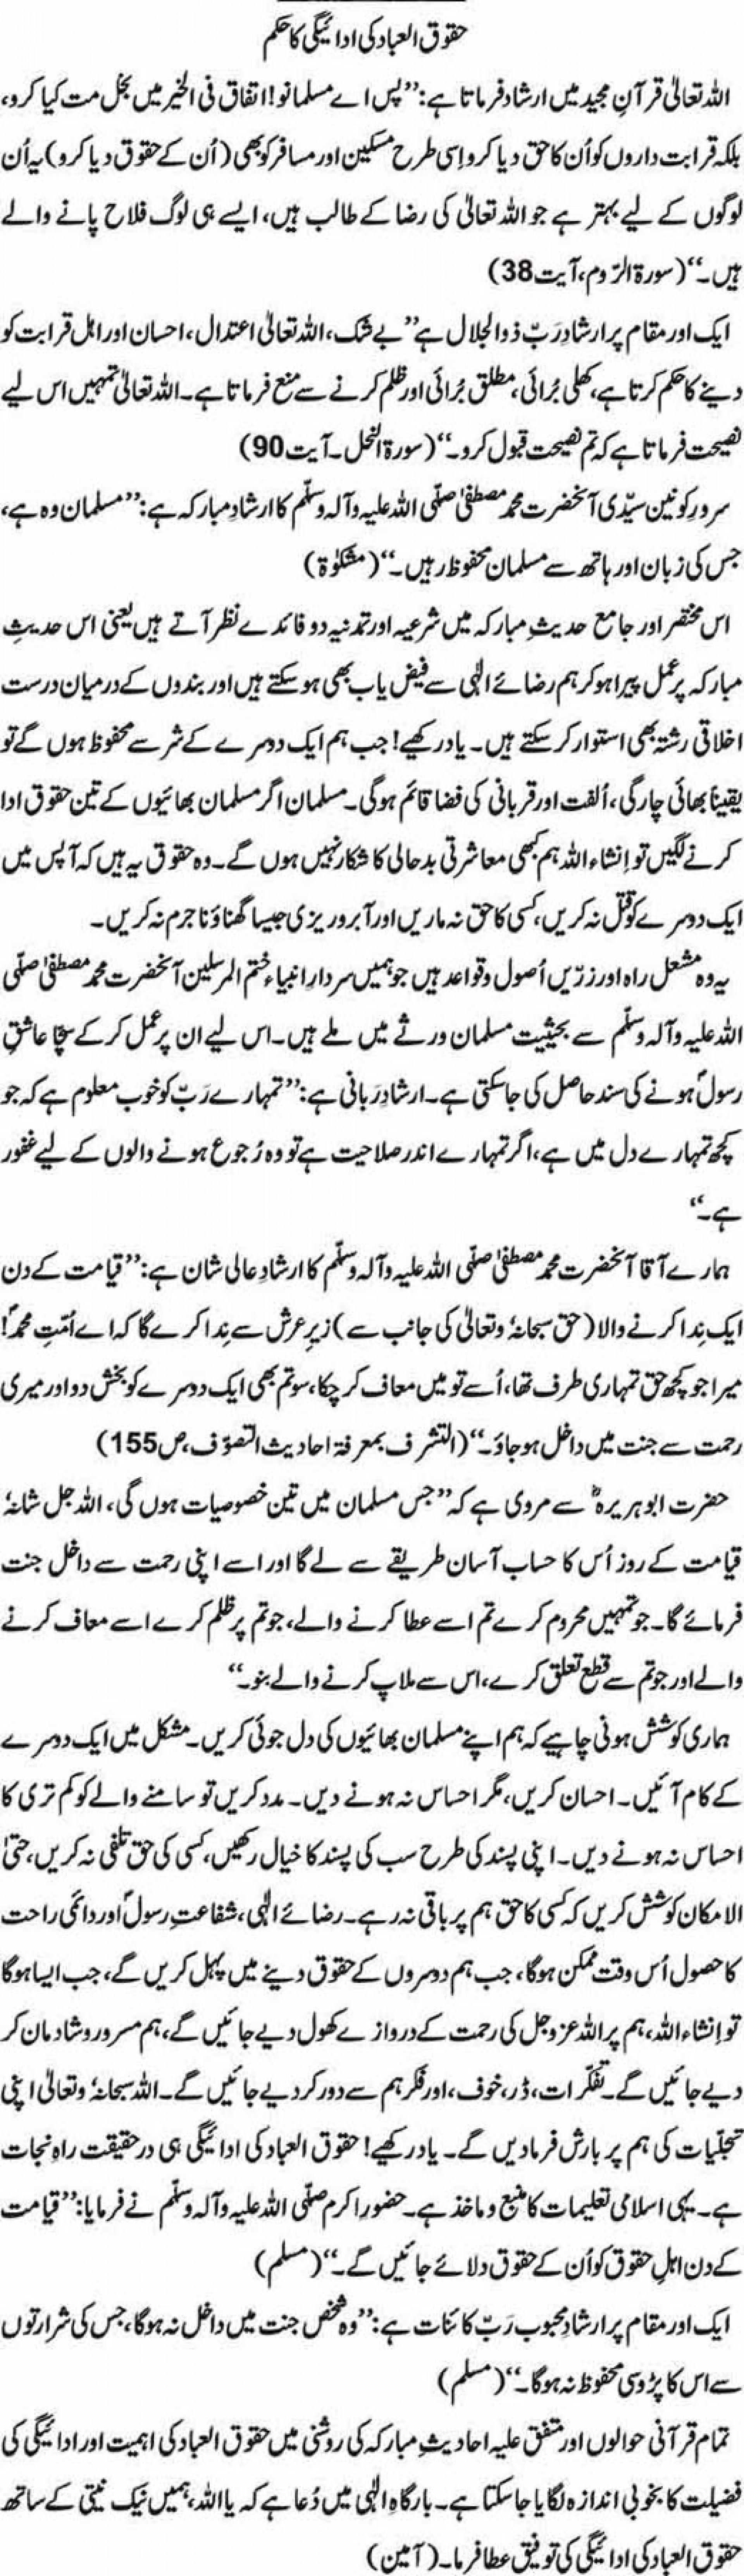 001 Harkat Mein Barkat Essay In Urdu Example Haququl Amazing On Topic Hai Short 1920